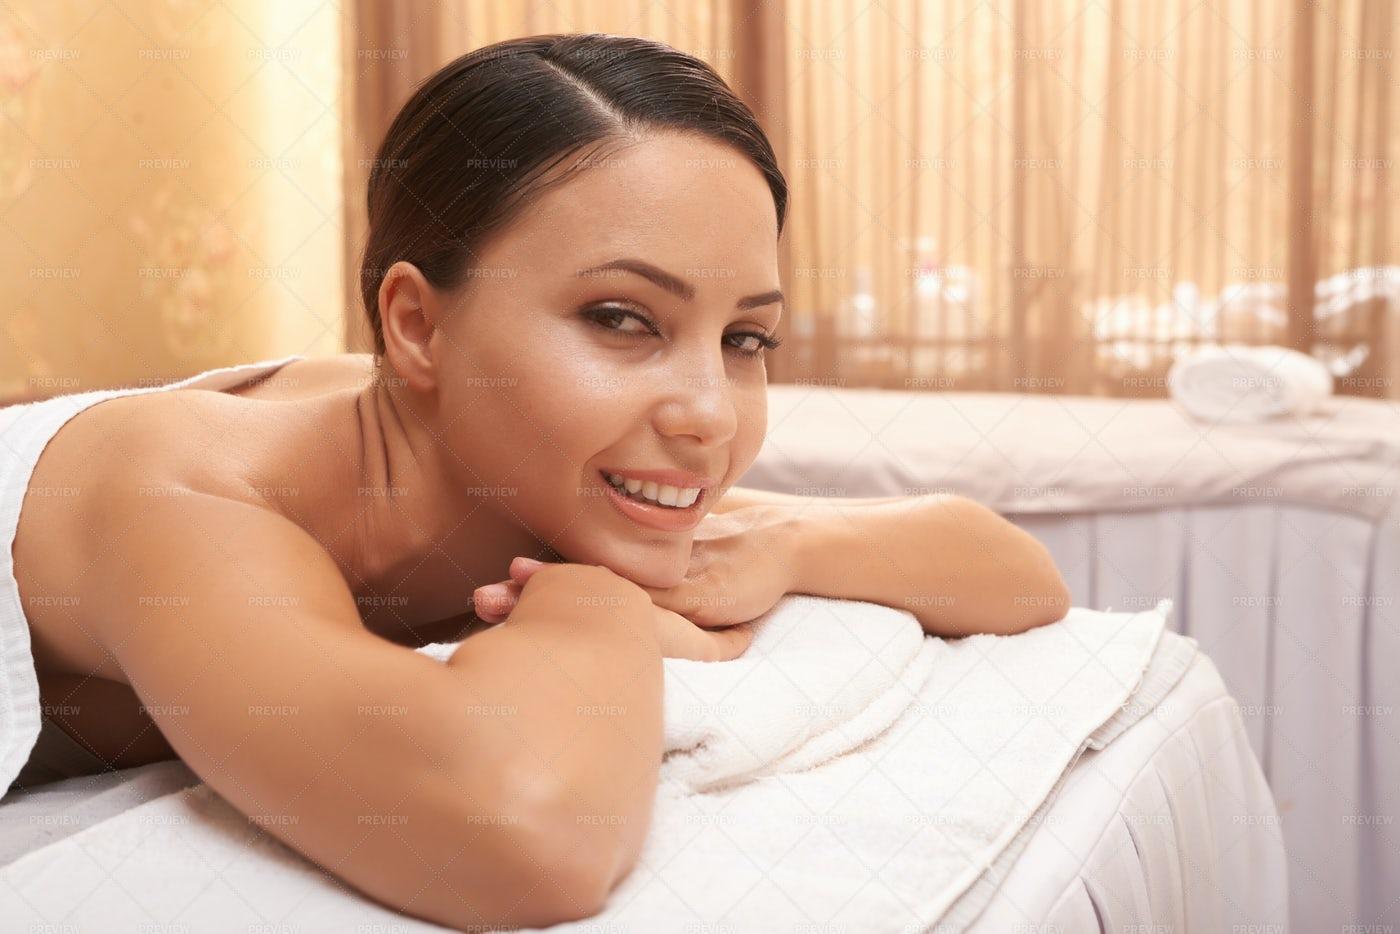 Asian Woman Relaxing At Spa: Stock Photos